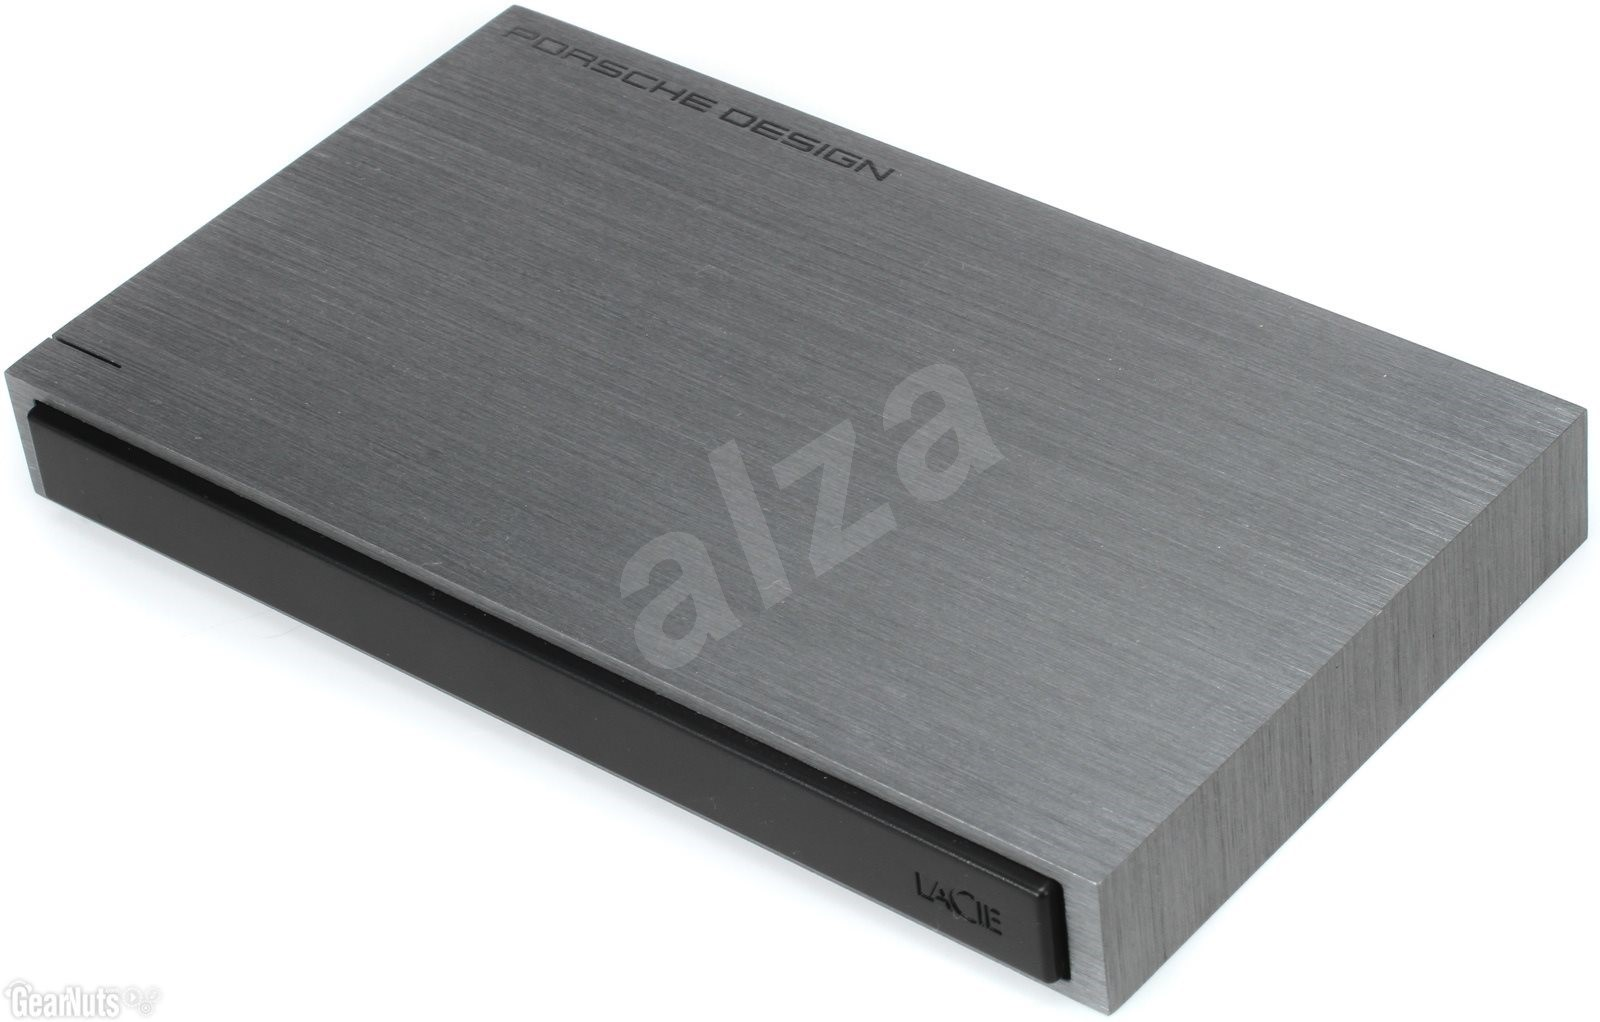 lacie 2 5 porsche design p 39 9220 1tb externe festplatte. Black Bedroom Furniture Sets. Home Design Ideas